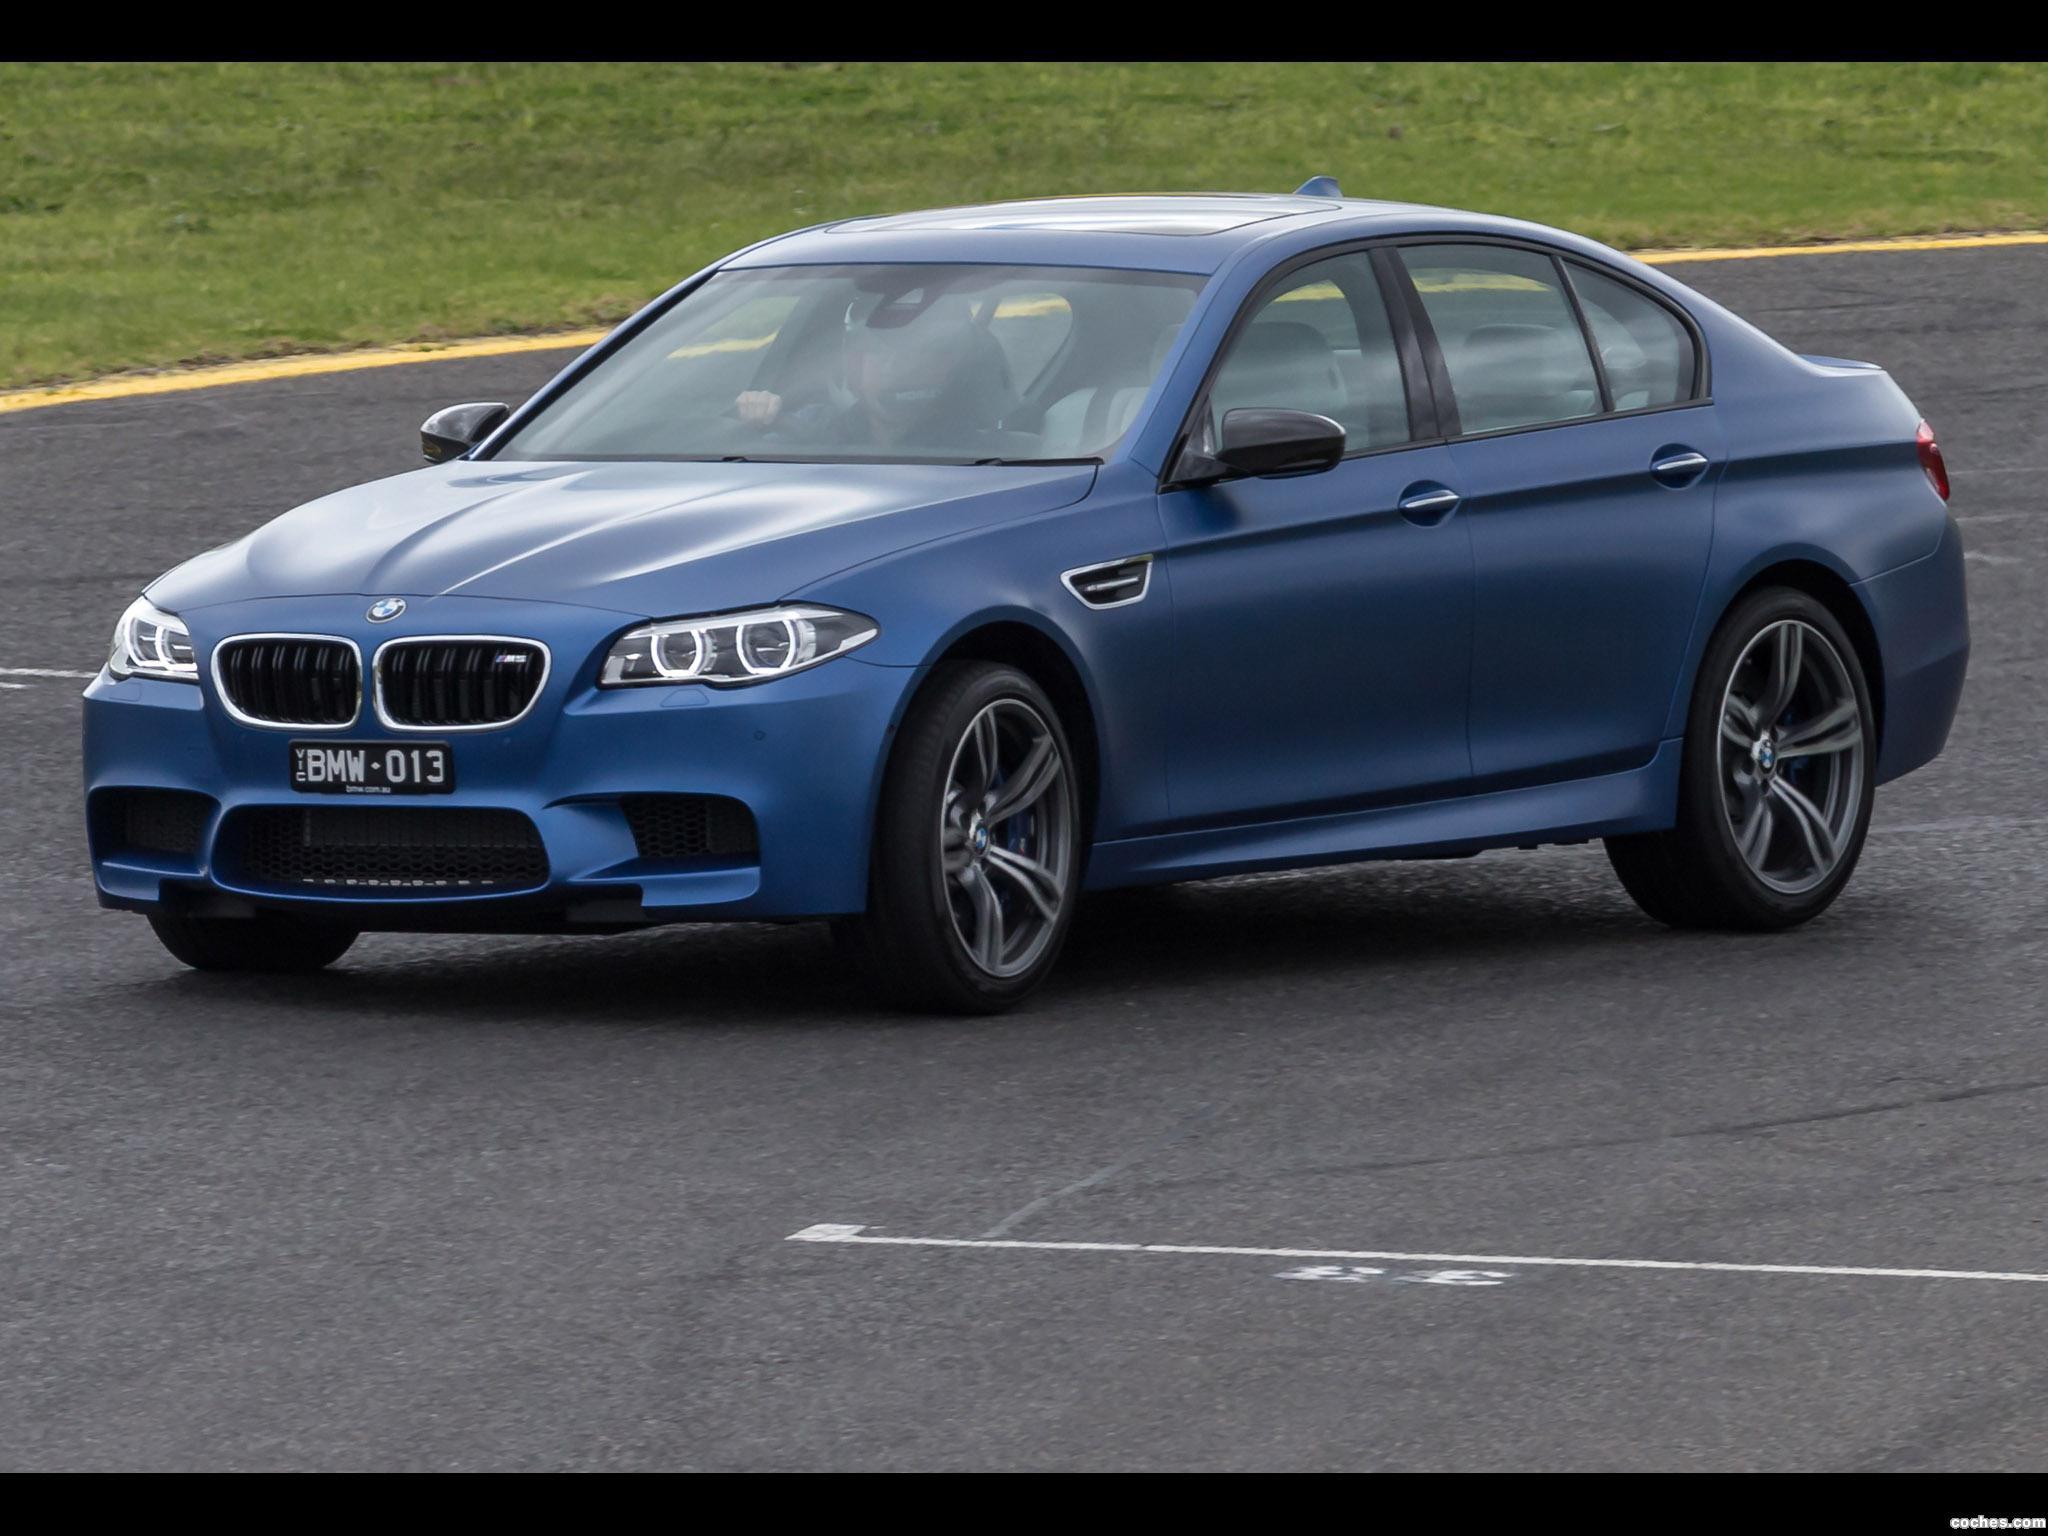 Foto 10 de BMW M5 Pure Edition F10 2015